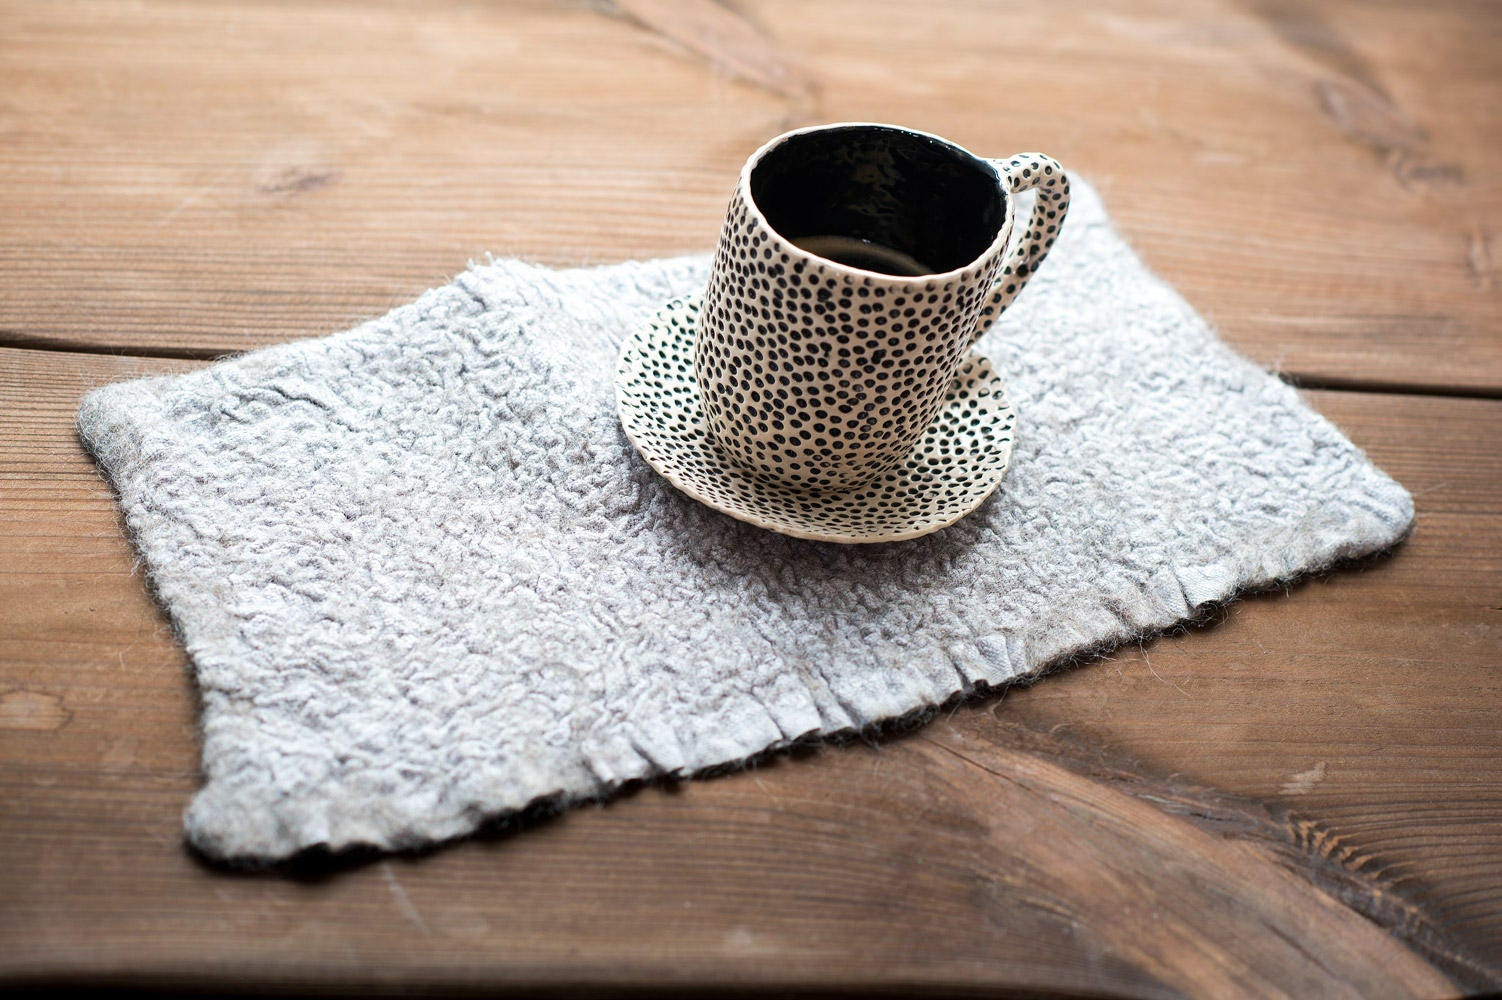 Rustic Look Linen And Wool Napkin Heatresistant Linen Placemats Linen  Table Decor Linen Home Decor